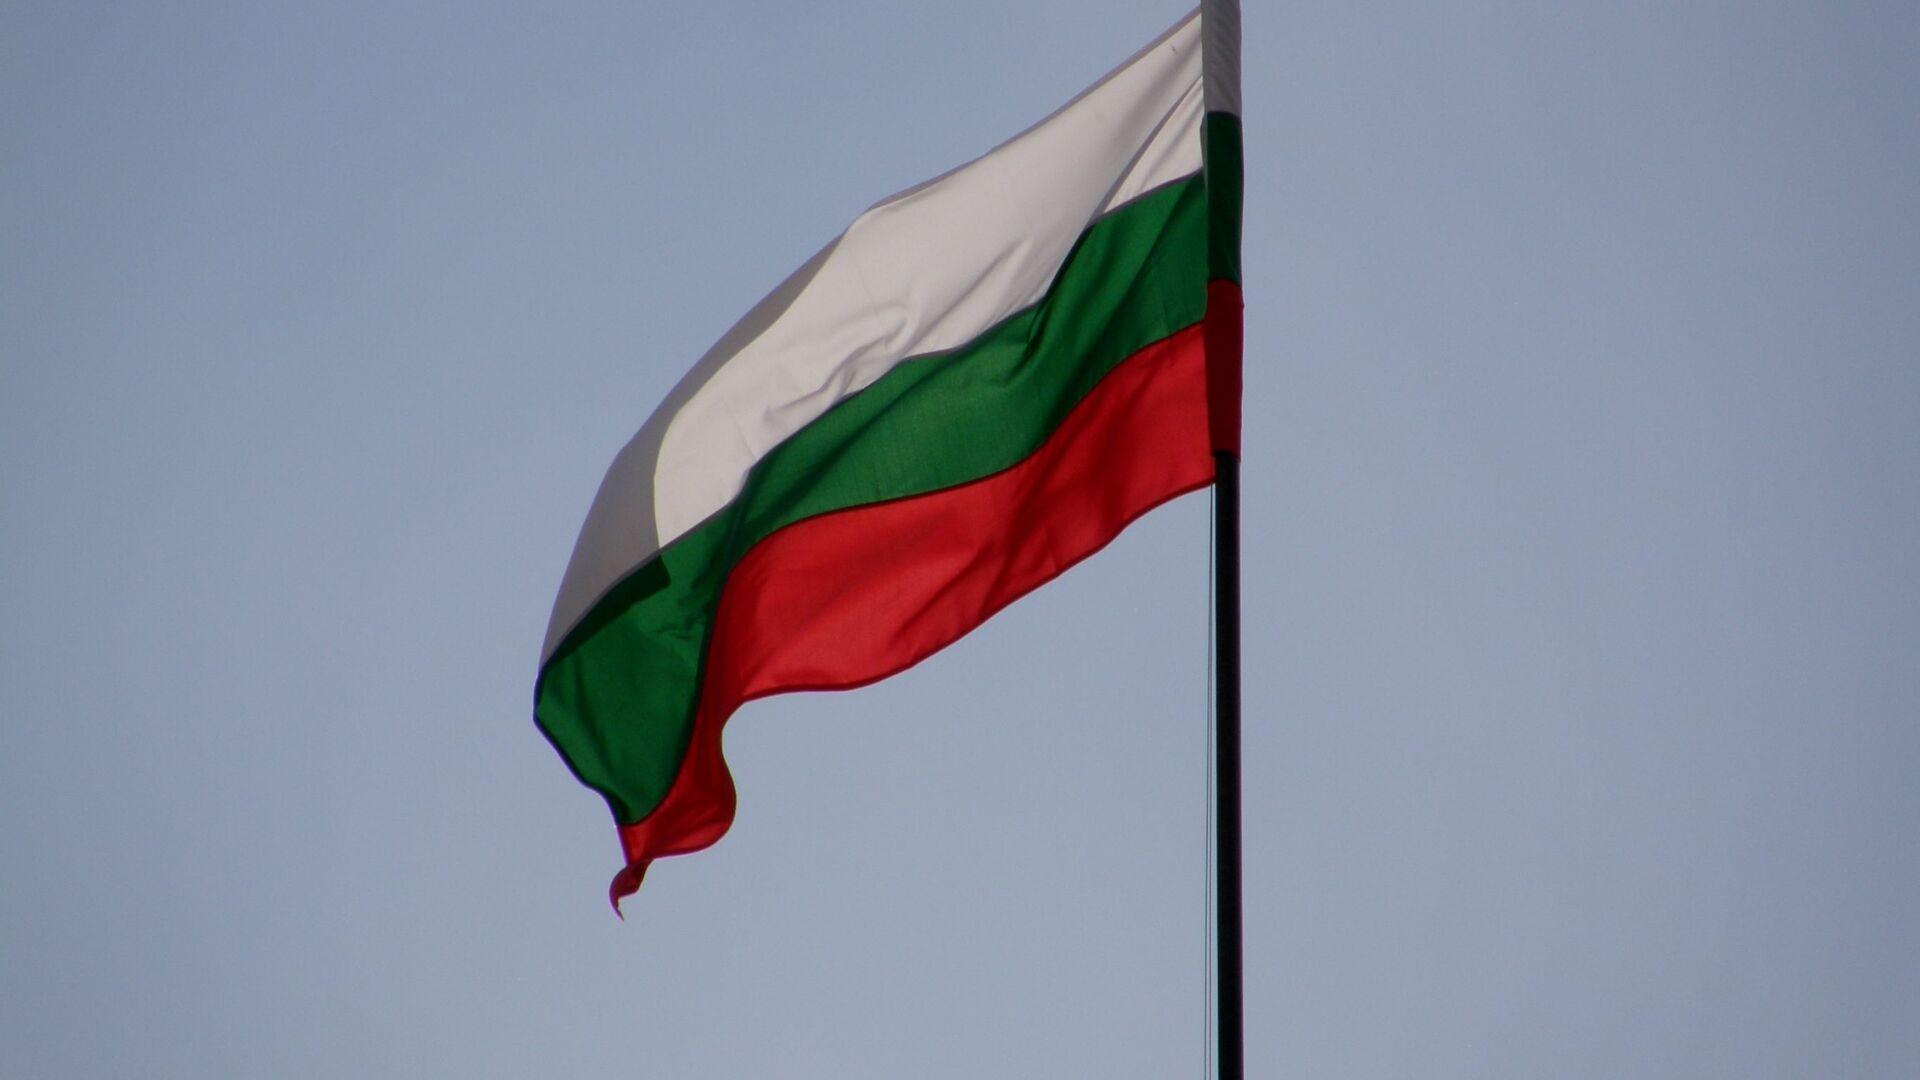 Bandera de Bulgaria - Sputnik Mundo, 1920, 26.05.2021